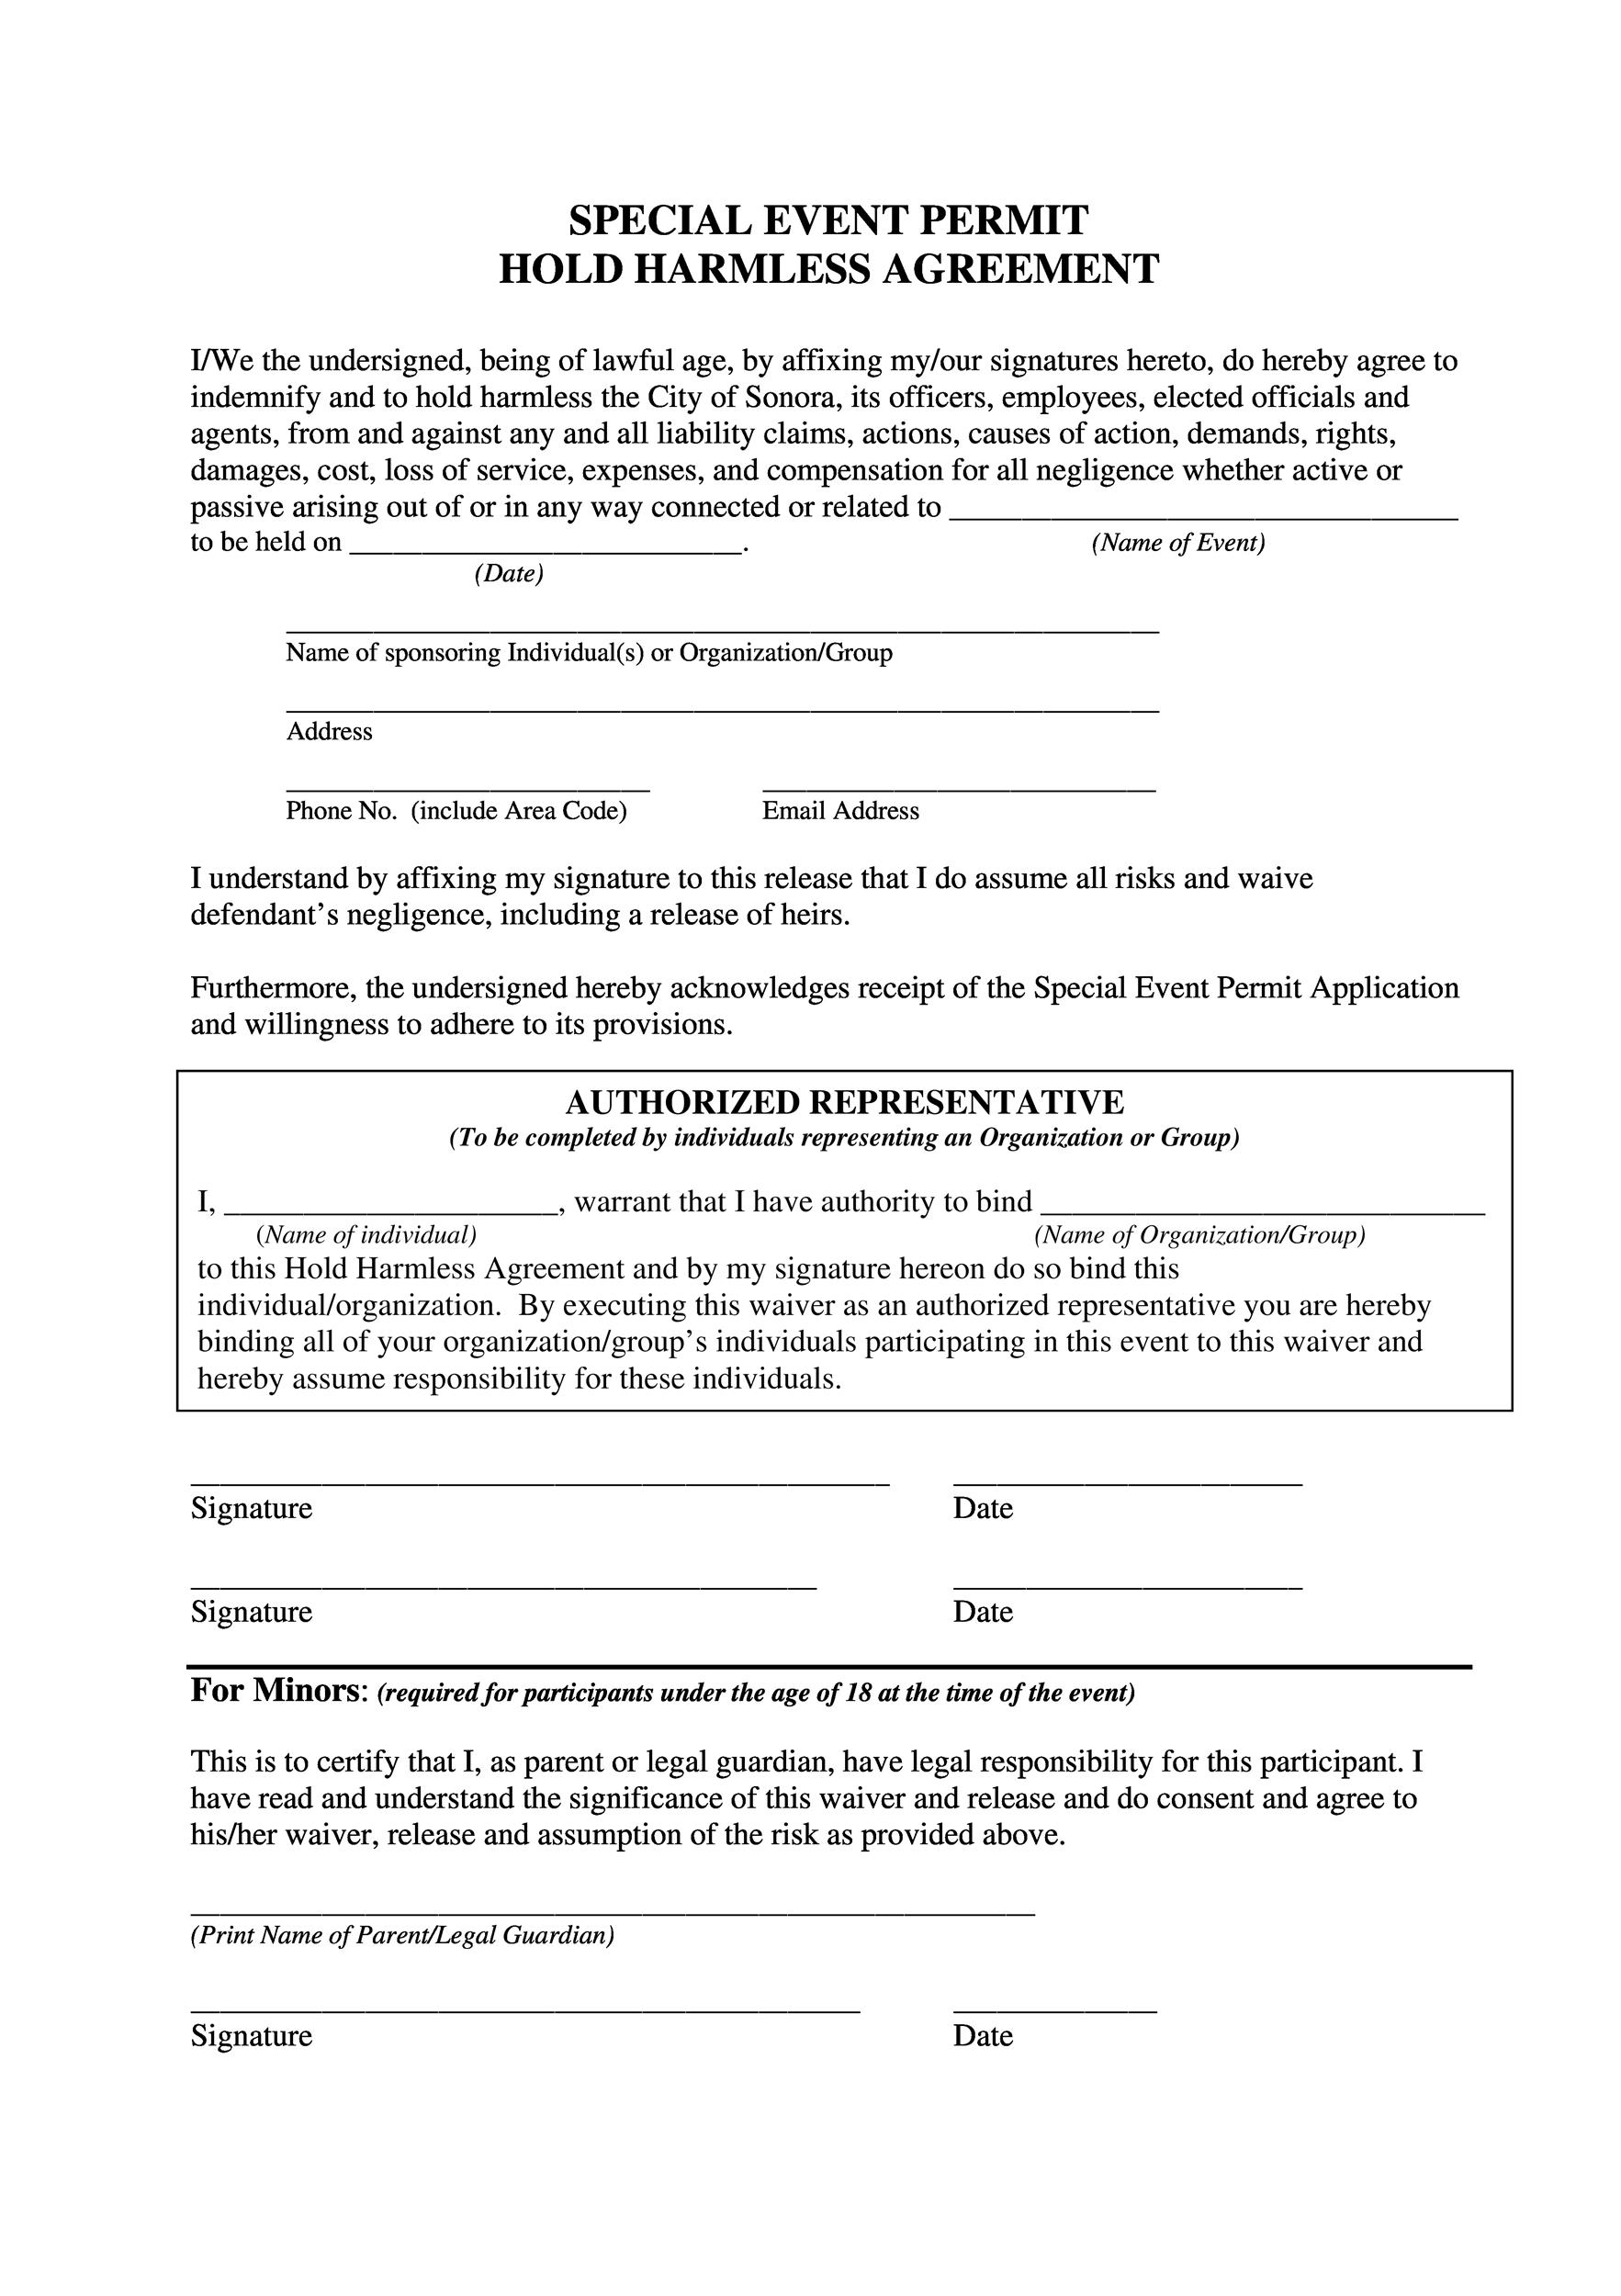 Hold harmless agreements